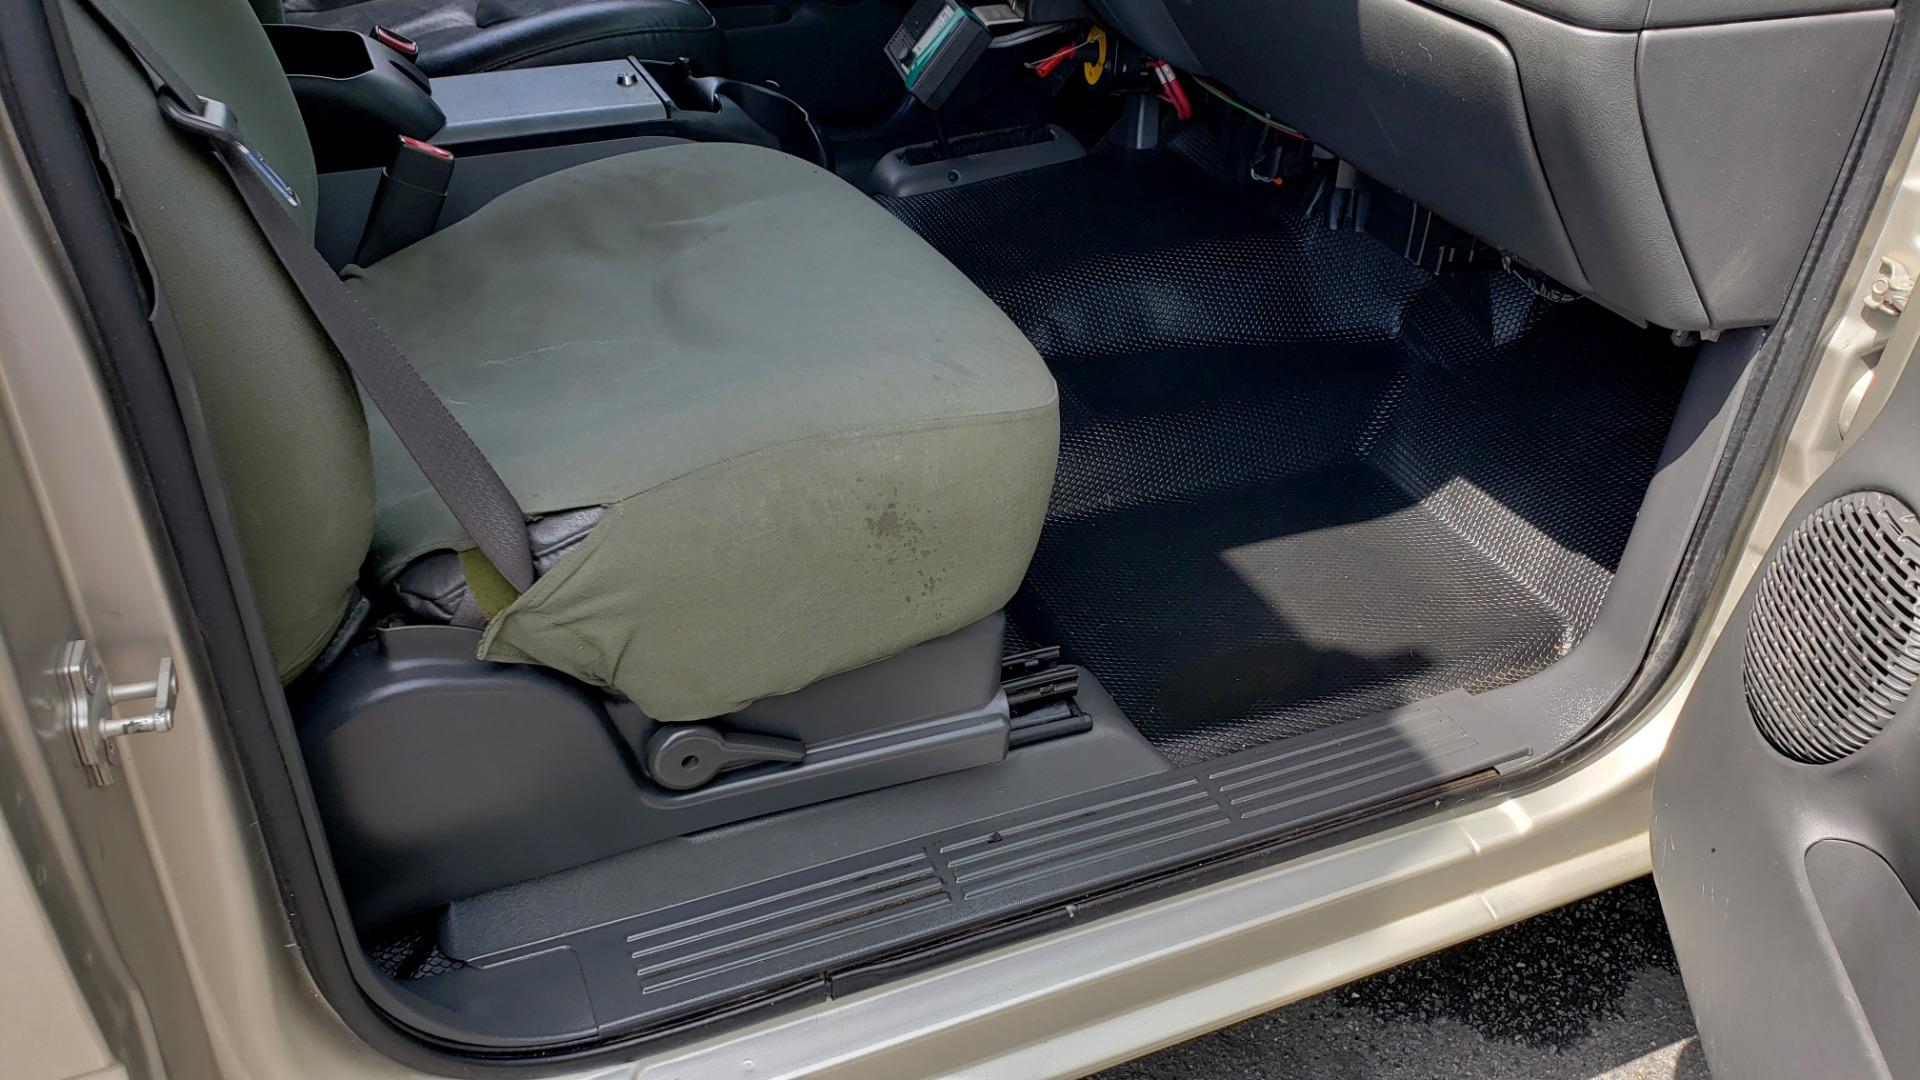 Used 2005 Chevrolet SILVERADO 3500 DRW / 4WD / REG CAB / 6.6L DURAMAX / DOOMSDAY PREPPER for sale $21,595 at Formula Imports in Charlotte NC 28227 51